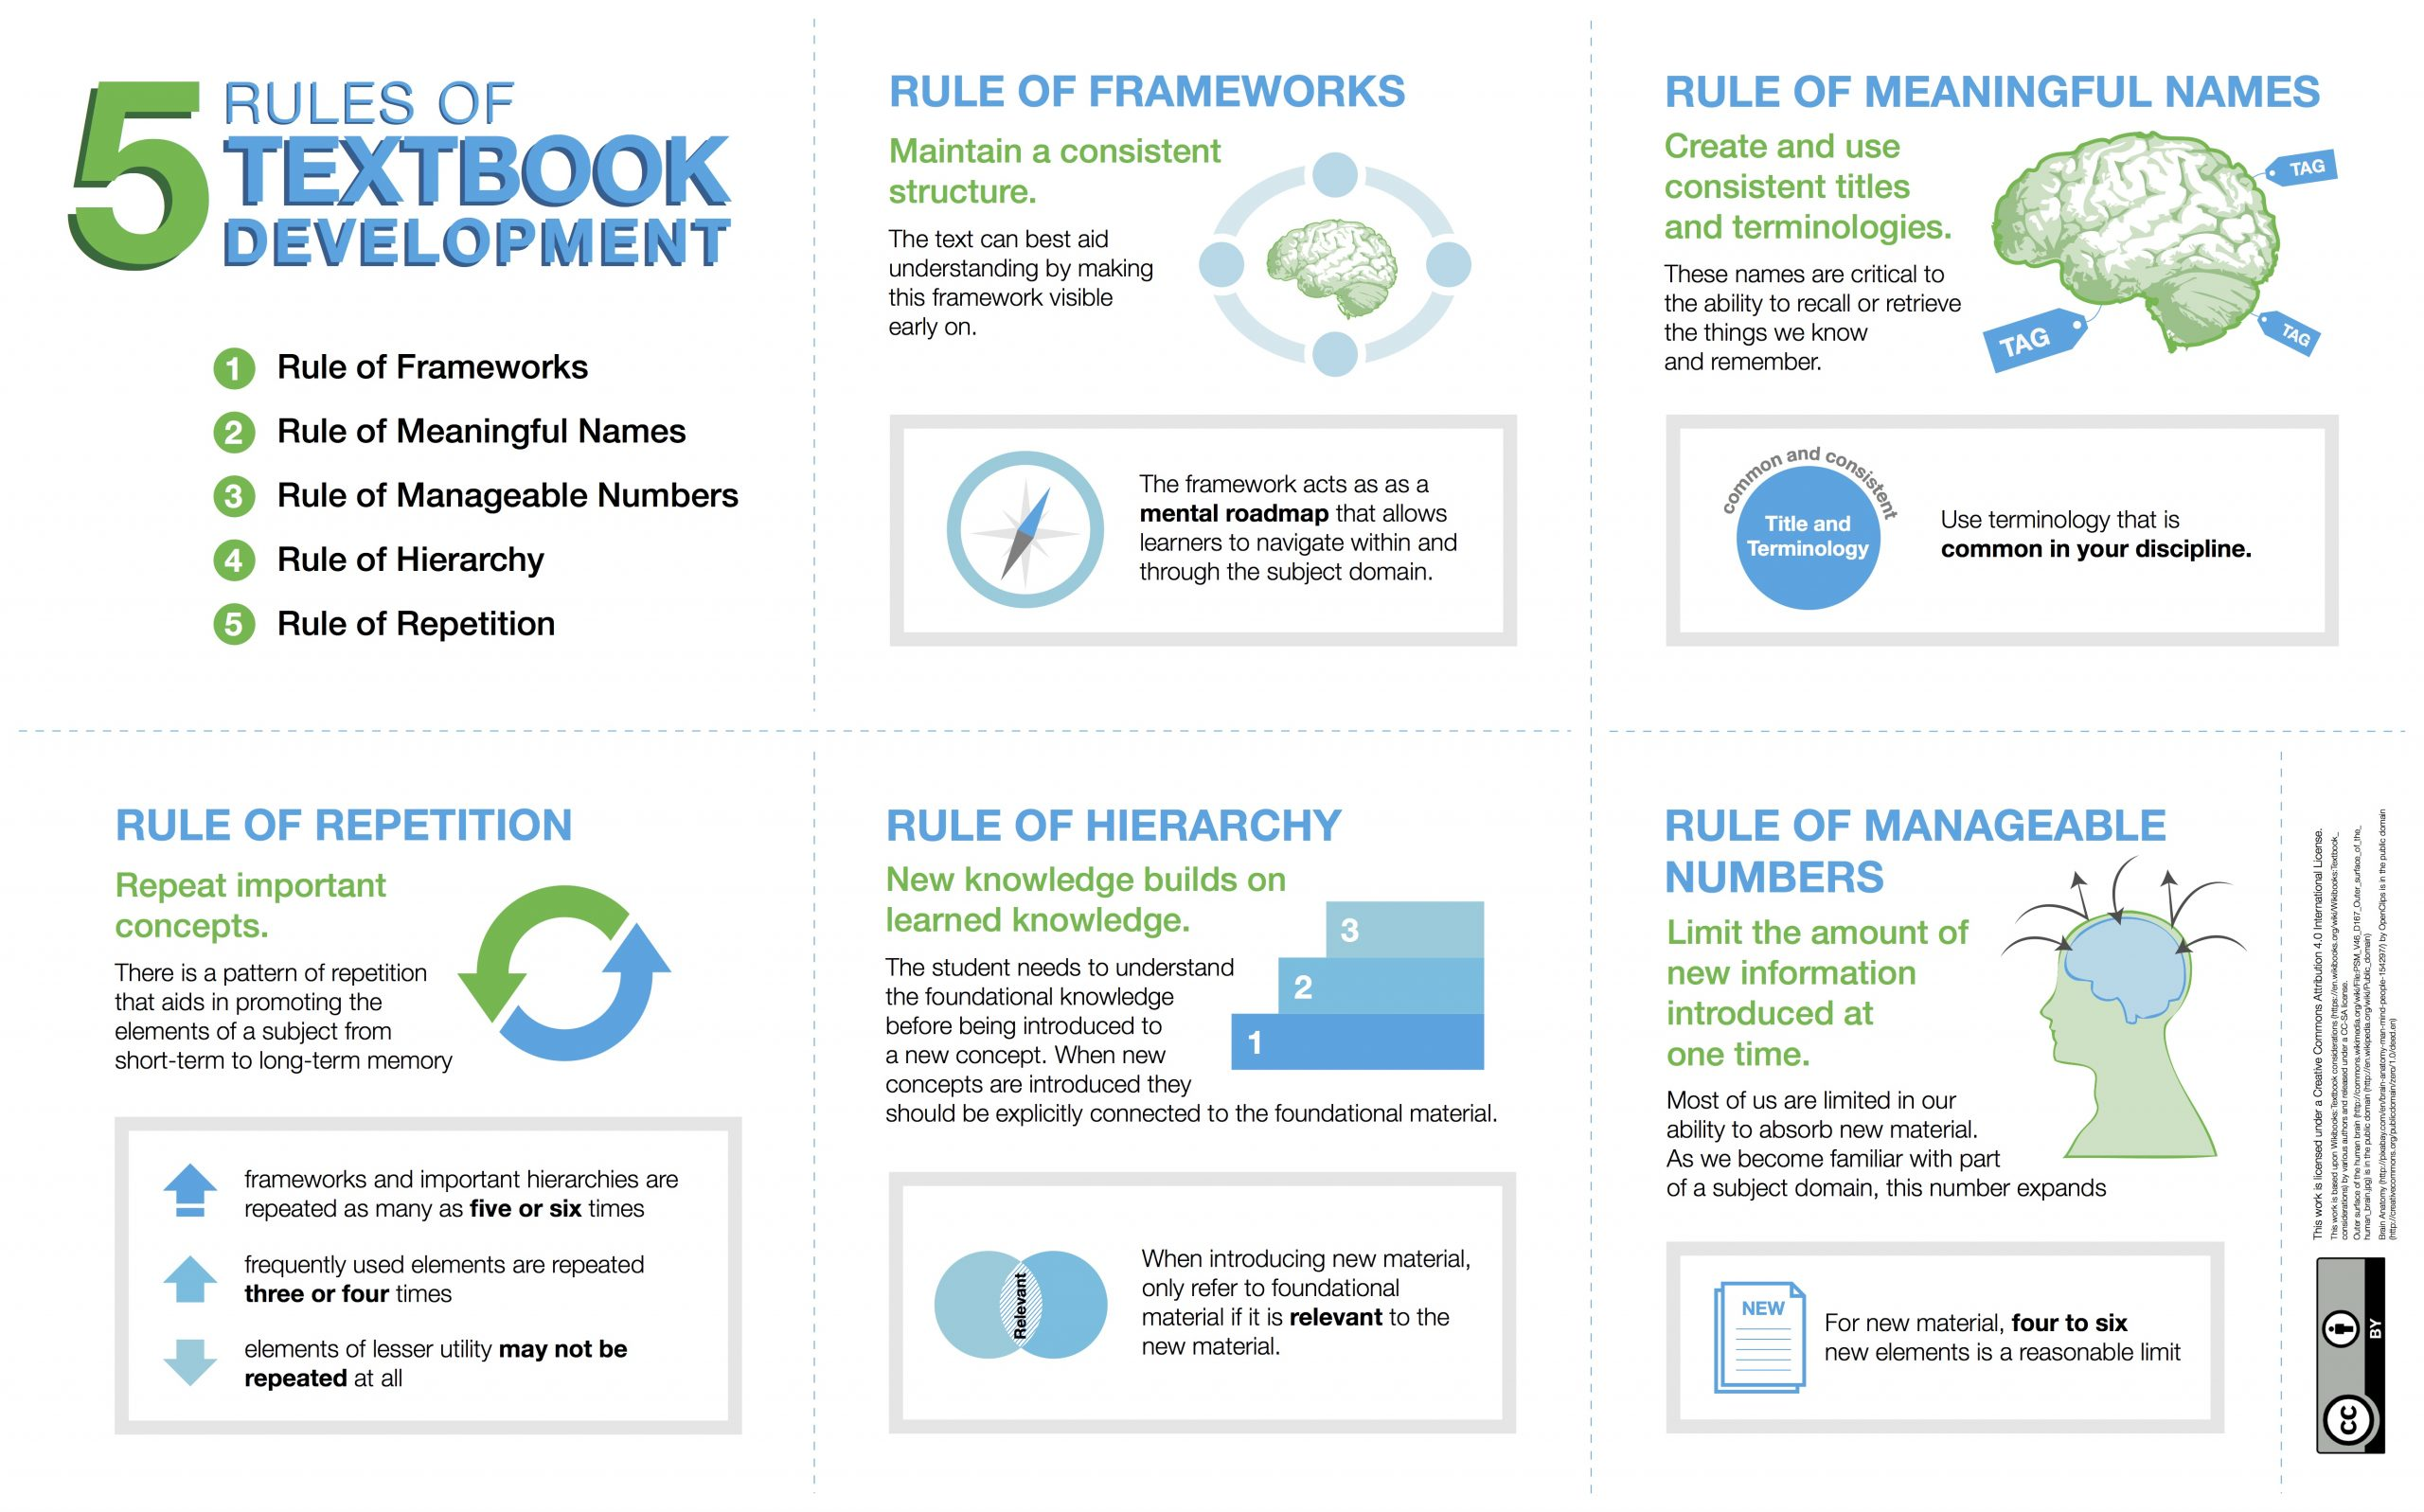 5 rules of textbook development. Long description available.